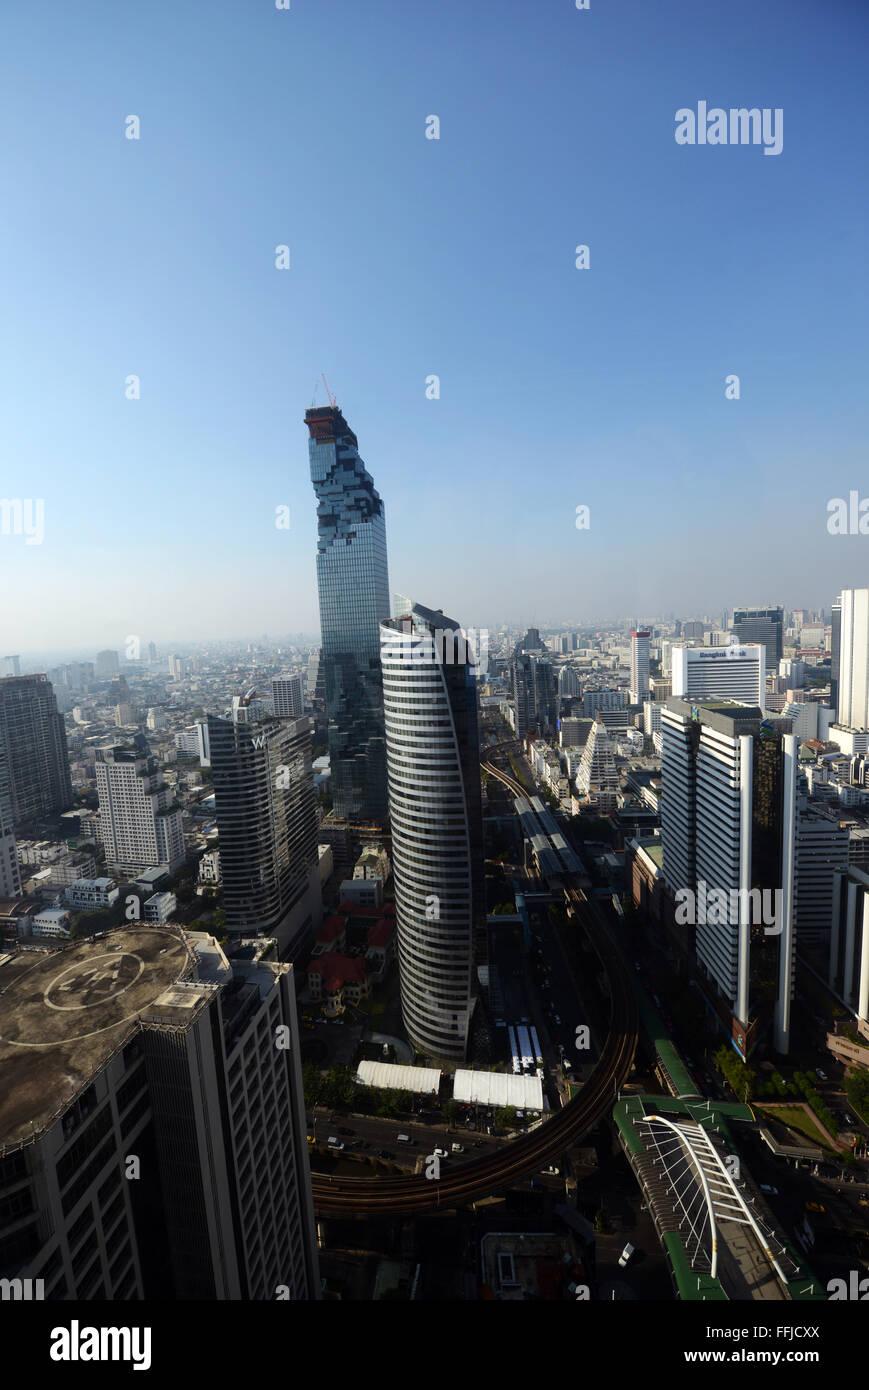 The ultra modern MahaNakhon Skyscraper in Bangkok, Thailand. - Stock Image